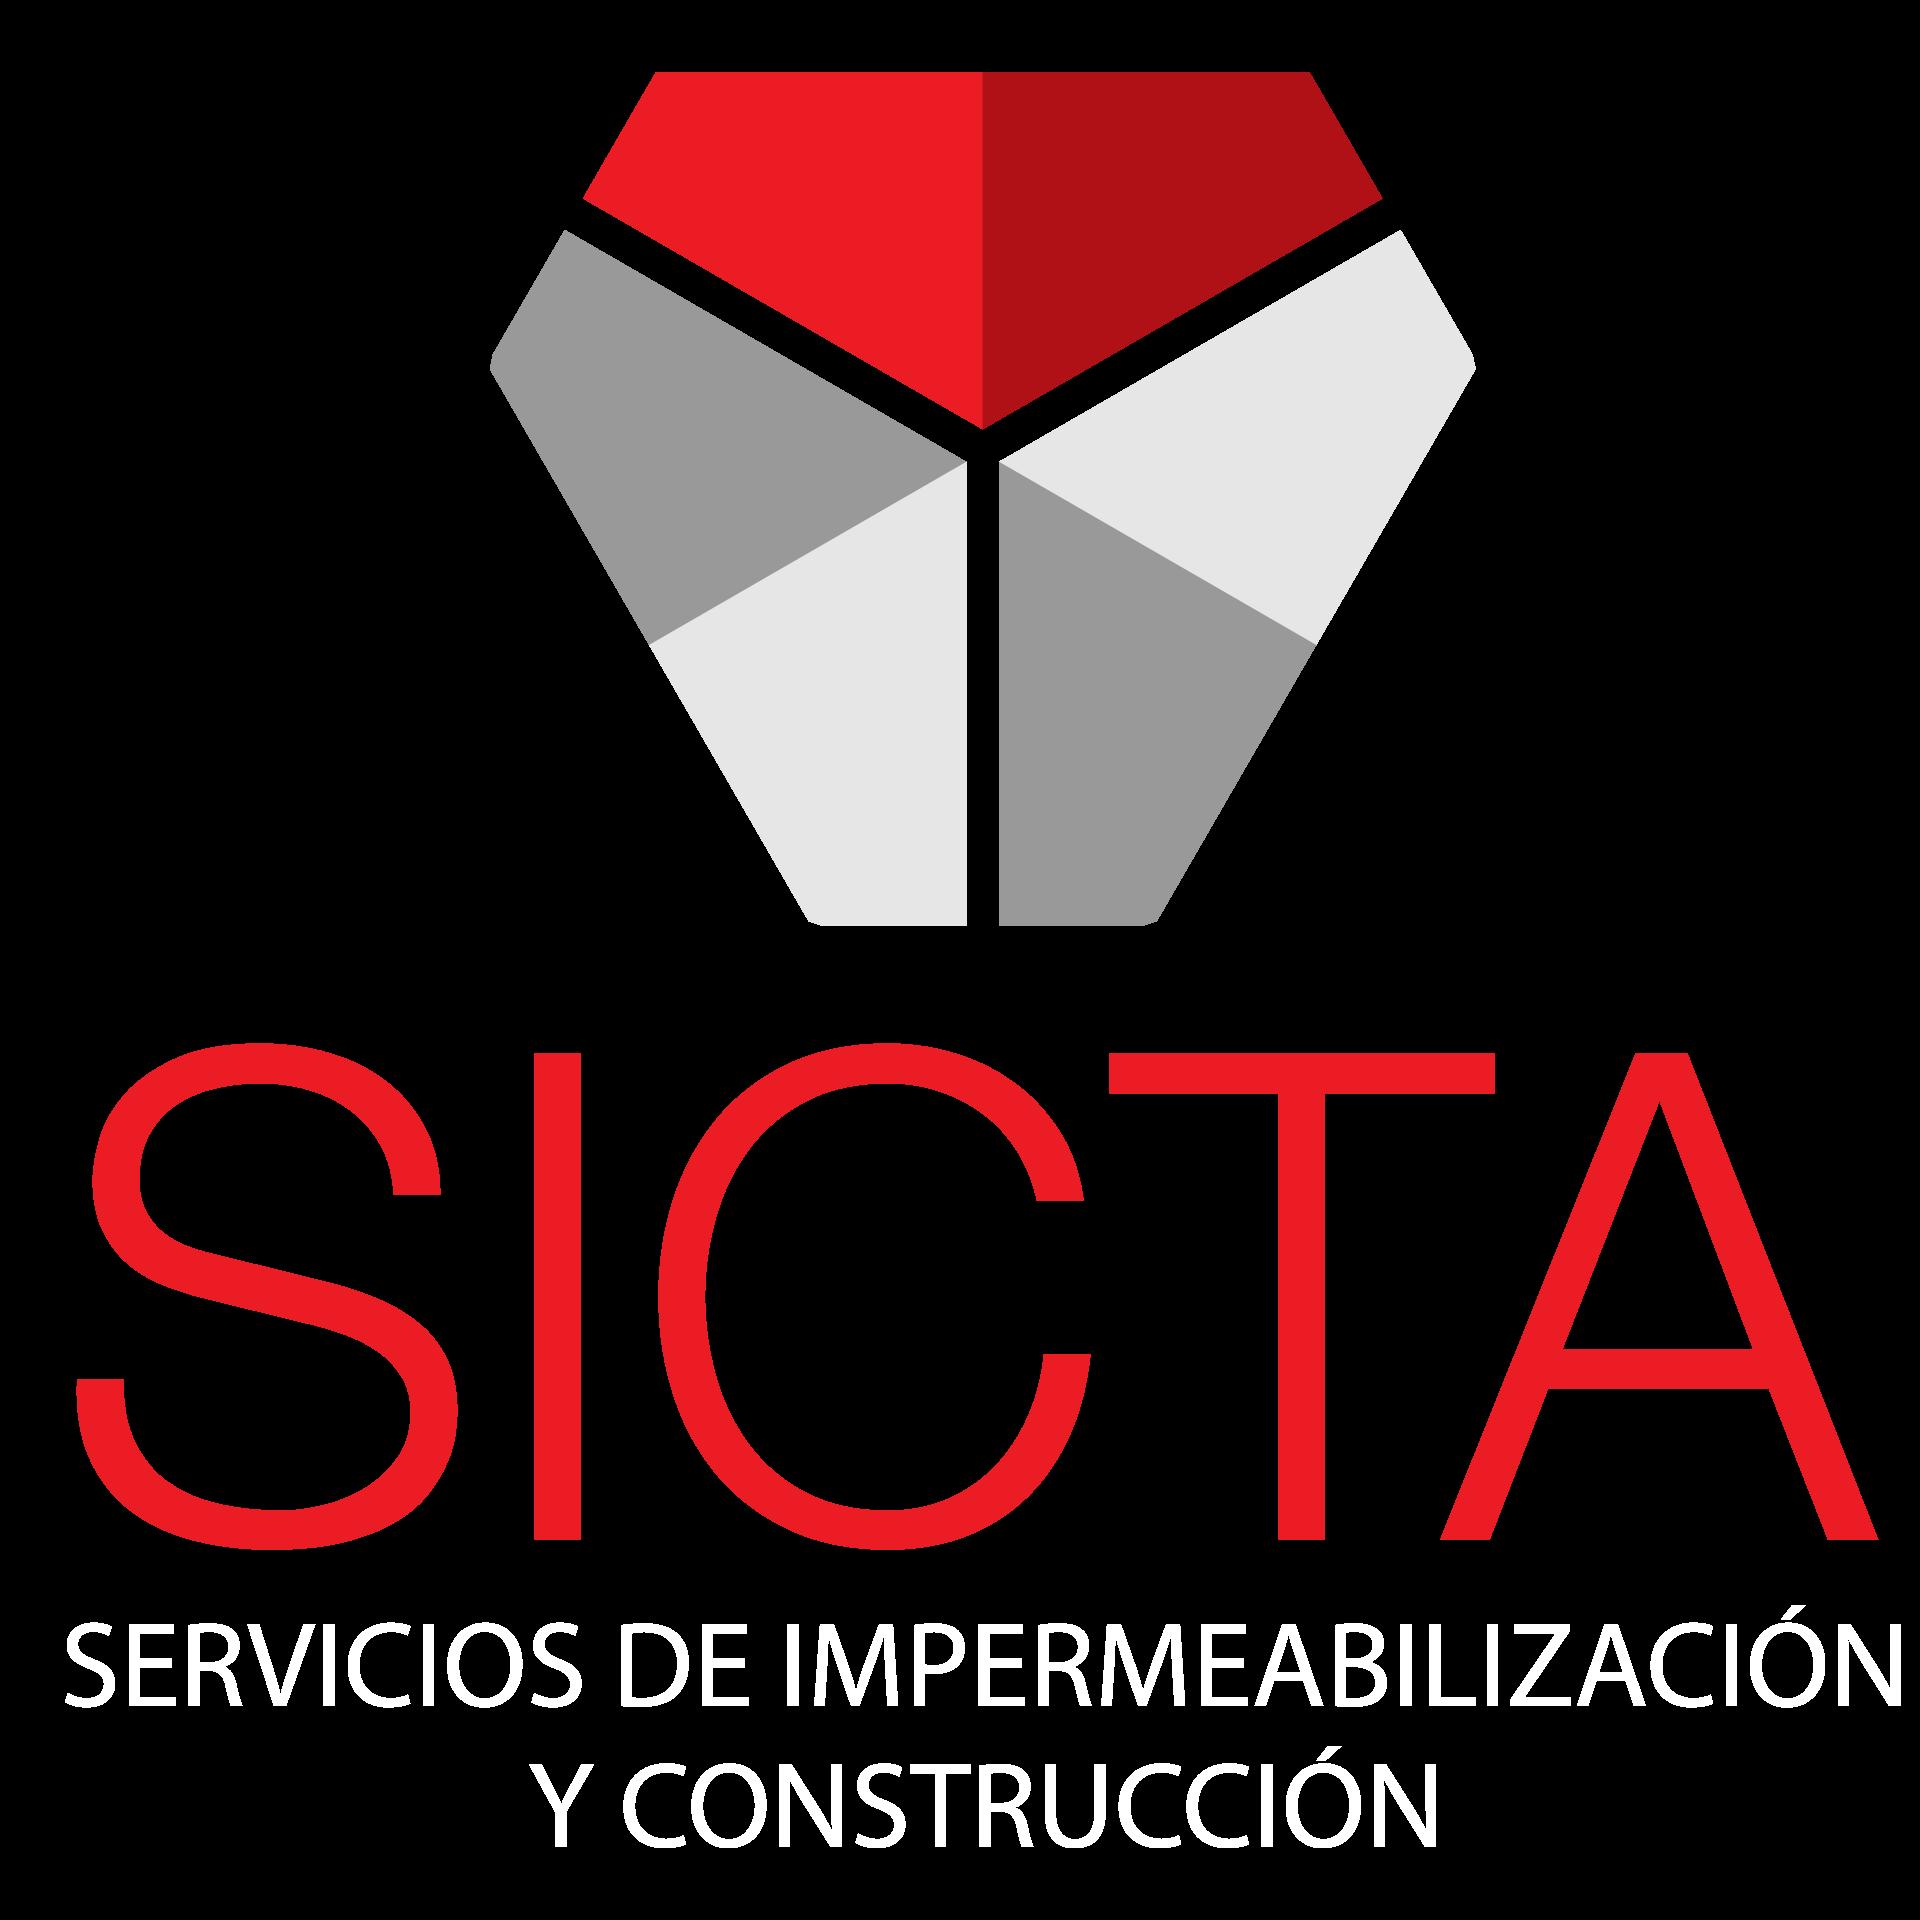 SICTA SpA